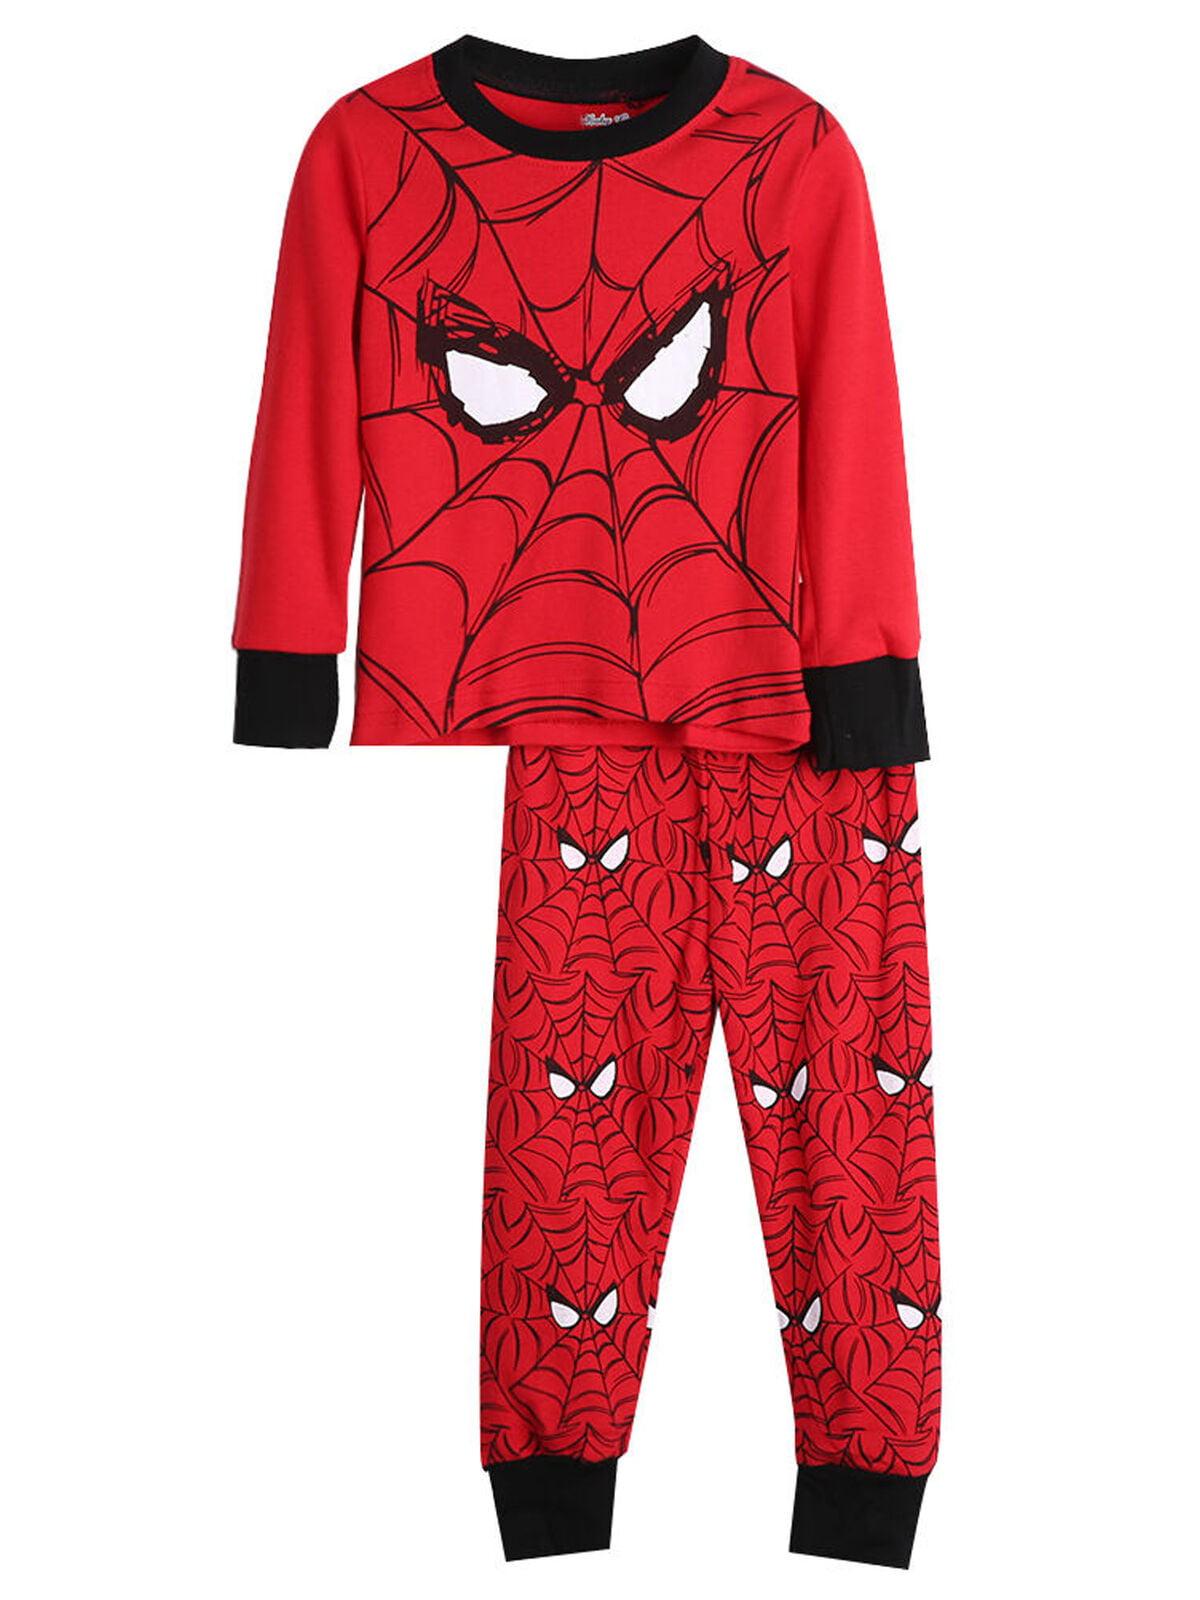 Spiderman kids boys girls Pyjamas tshirt top sleepwear lounge pajamas